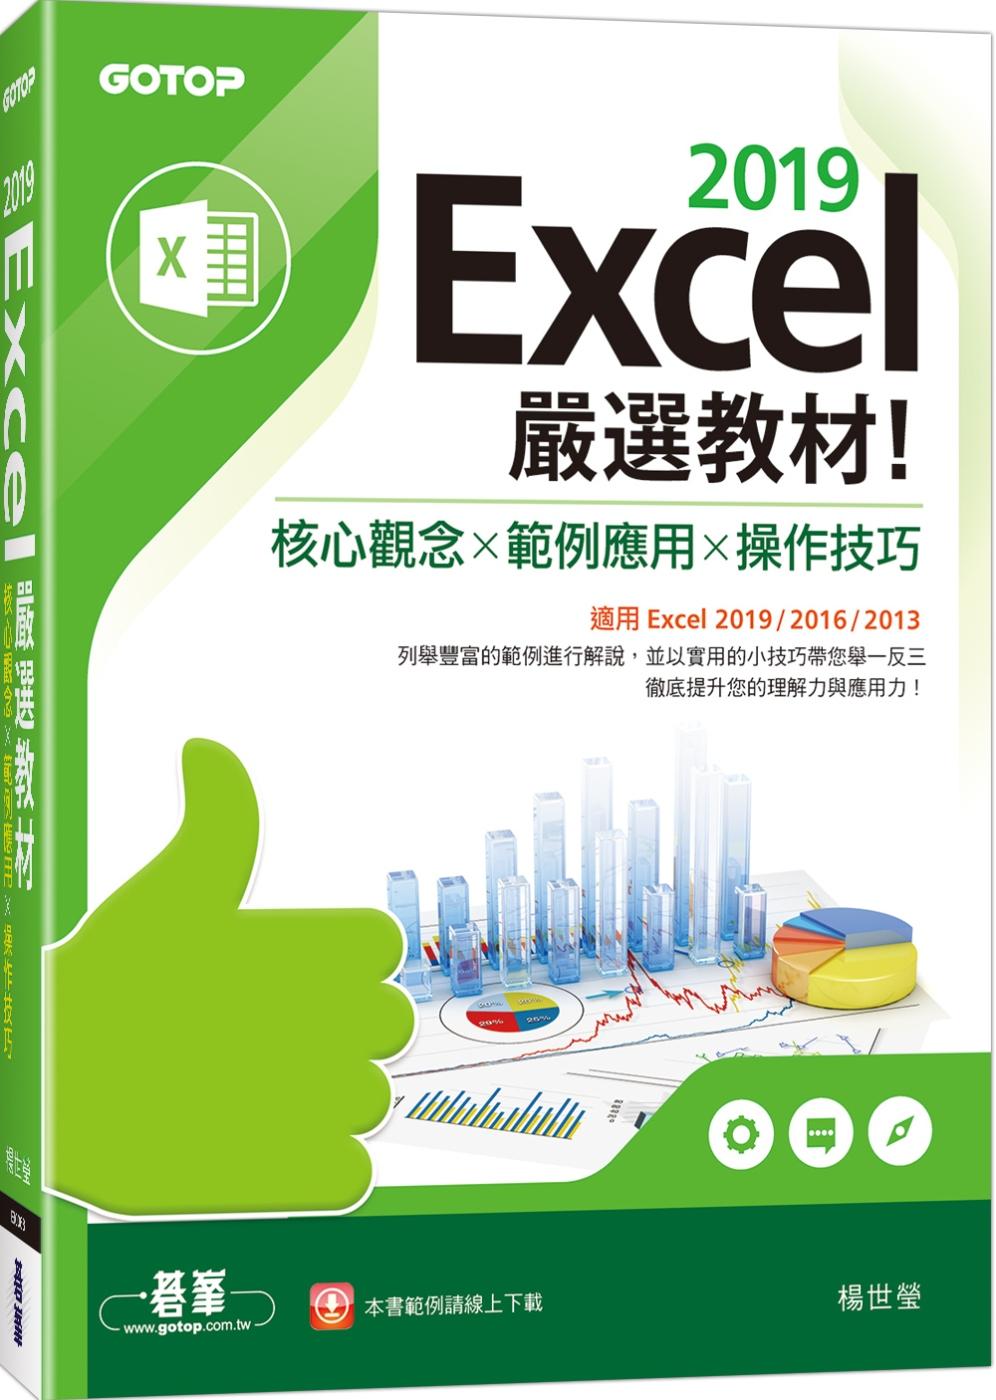 Excel 2019嚴選教材!核心觀念×範例應用×操作技巧(適用Excel 2019/2016/2013)